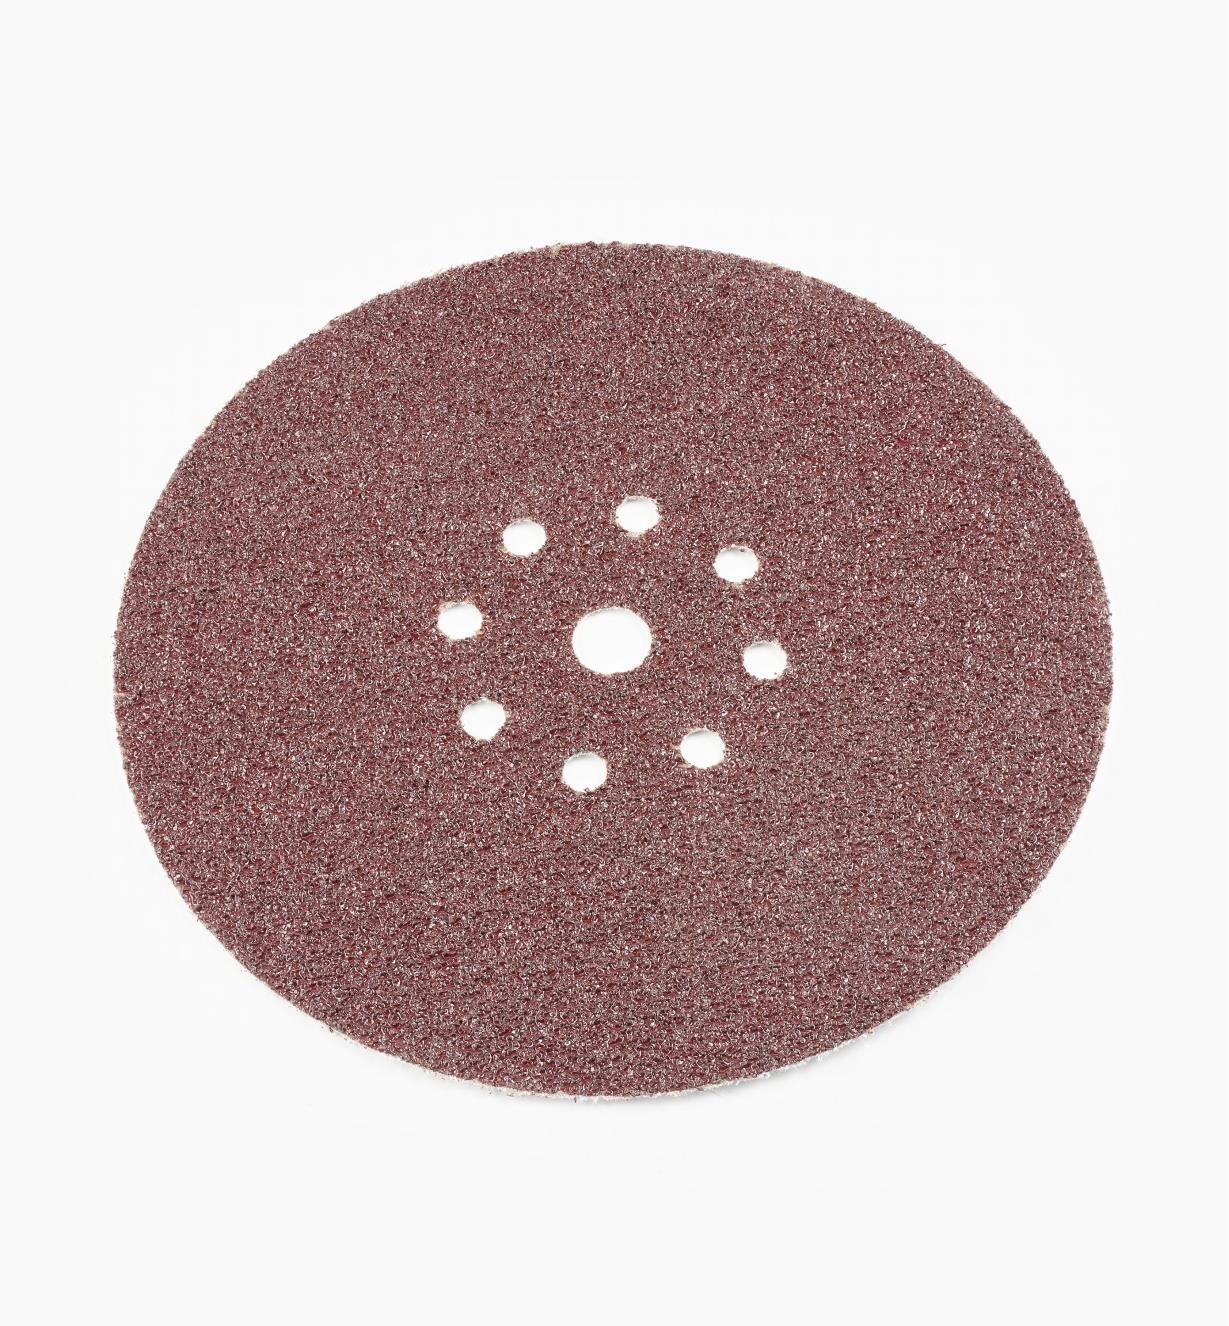 ZA495174 - Saphir Abrasive (P 24), 25 Qty.